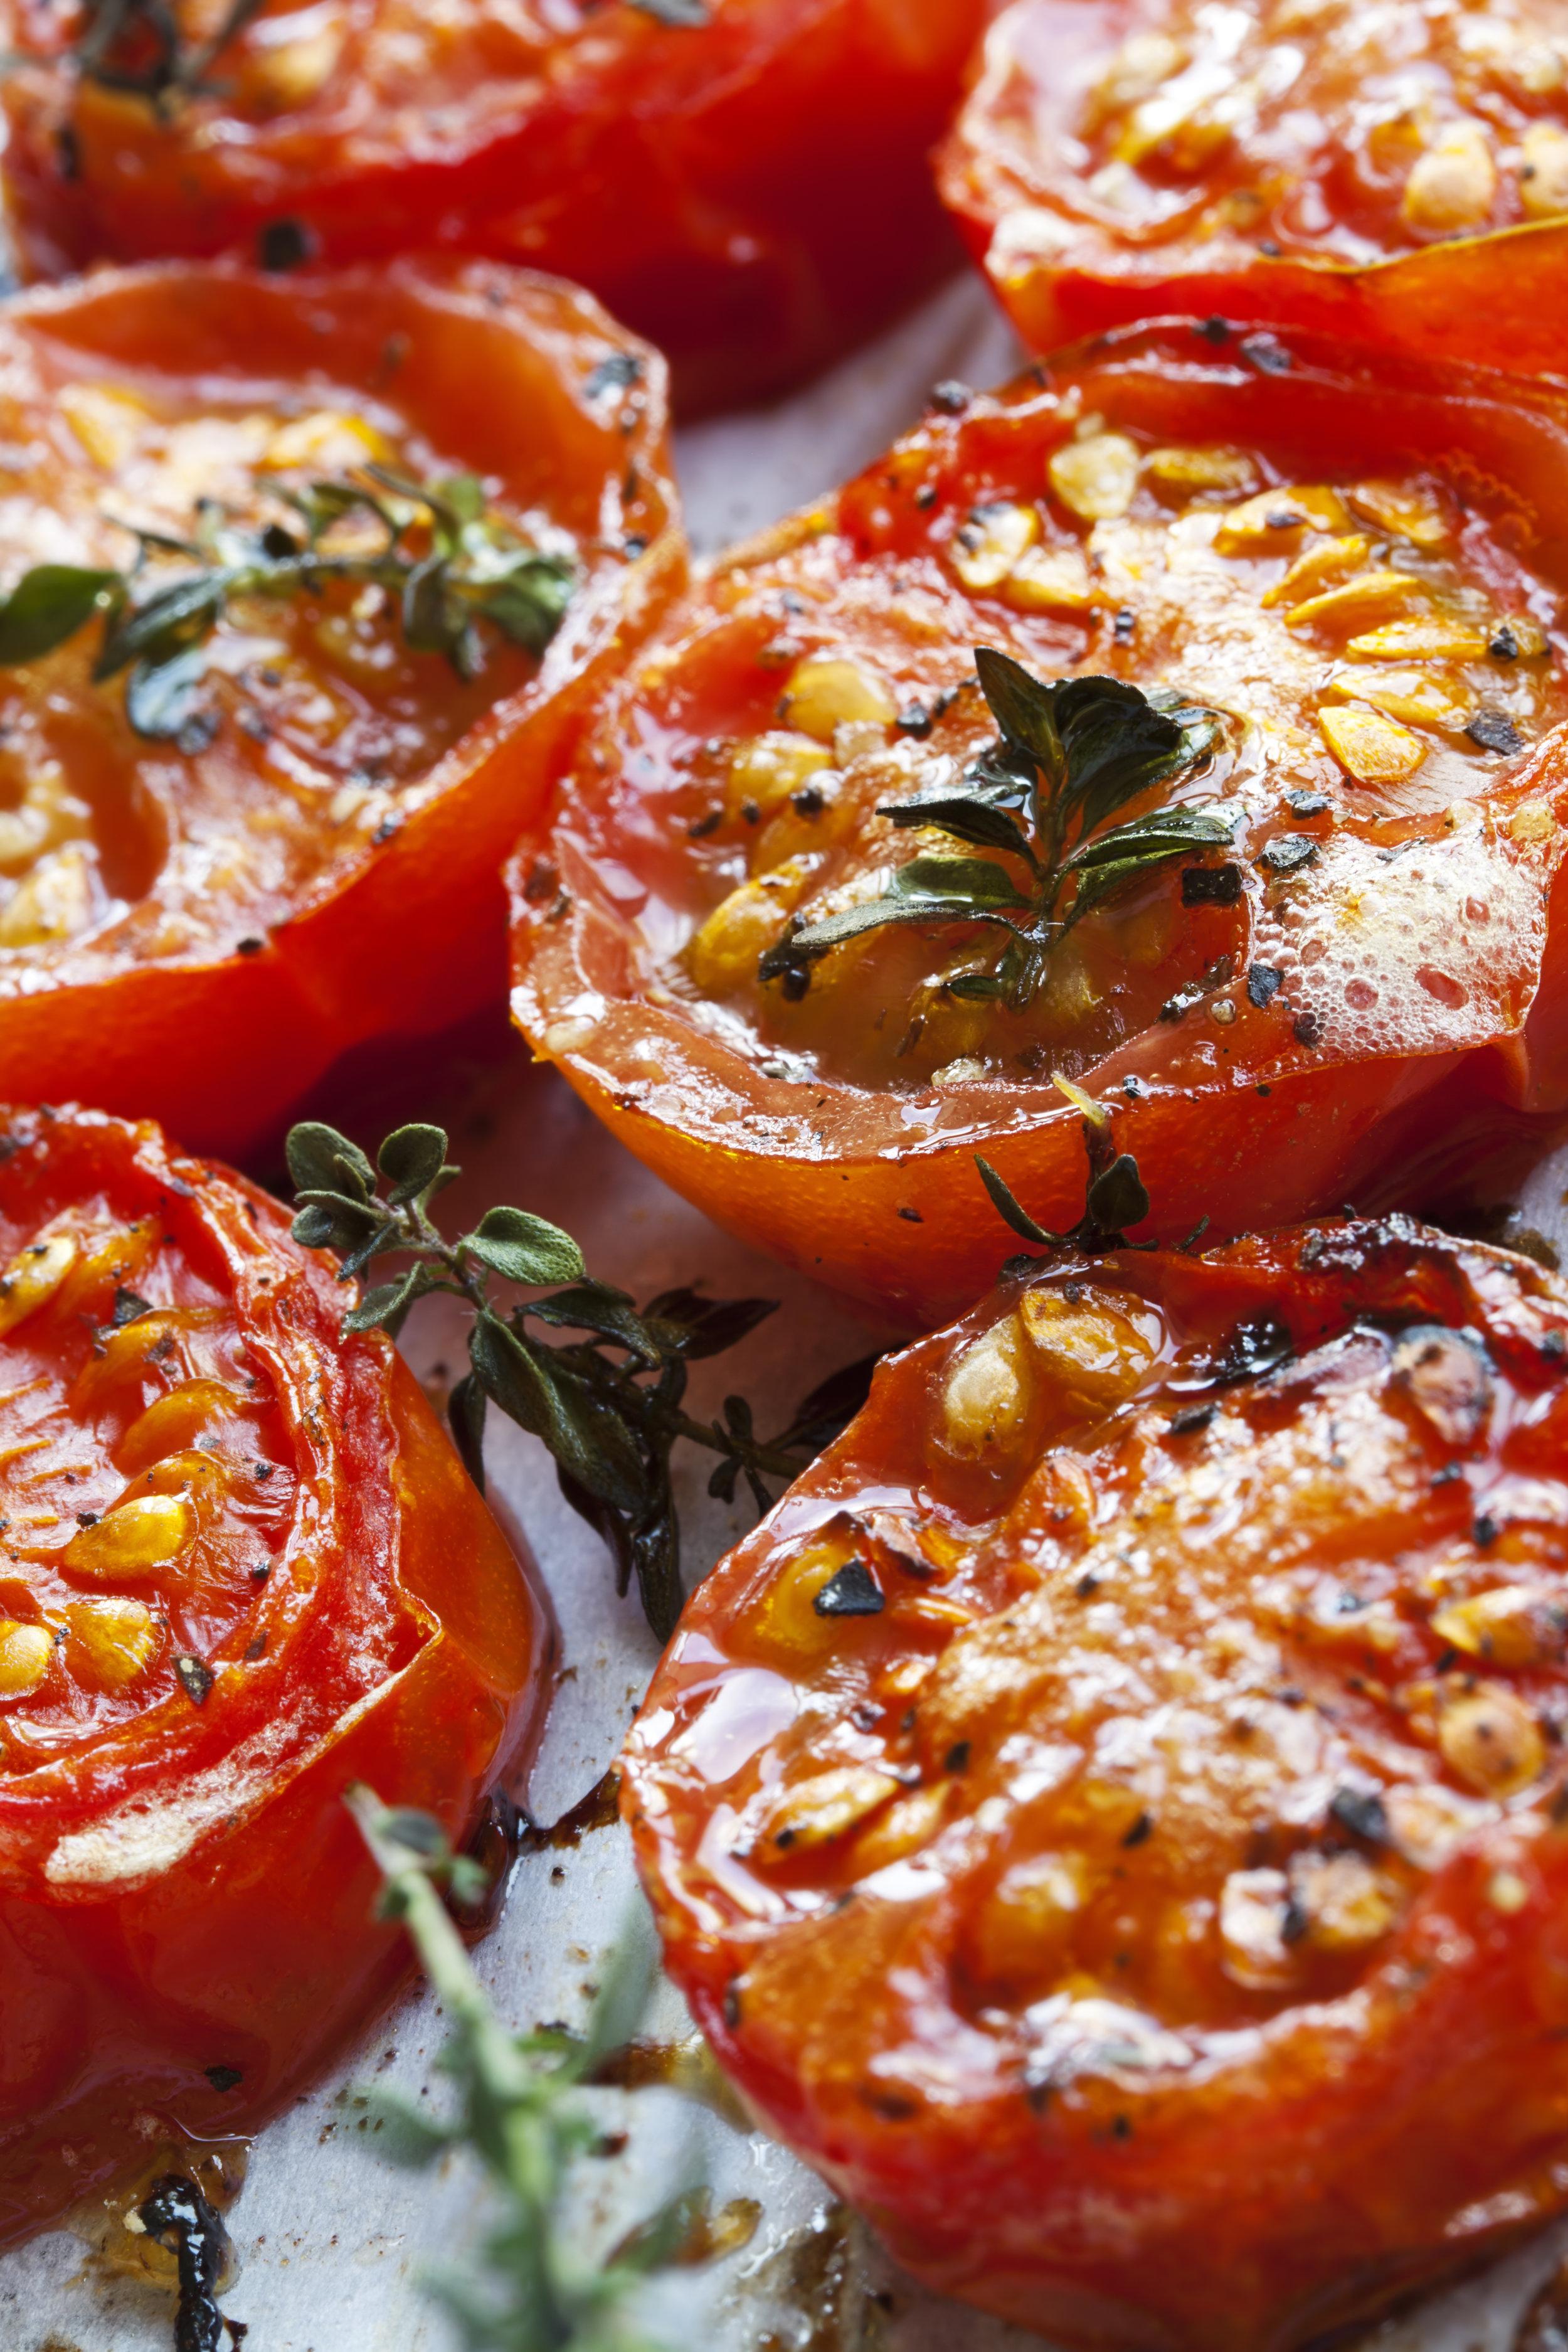 roasted-cherry-tomatoes-PV7N5LE.jpg